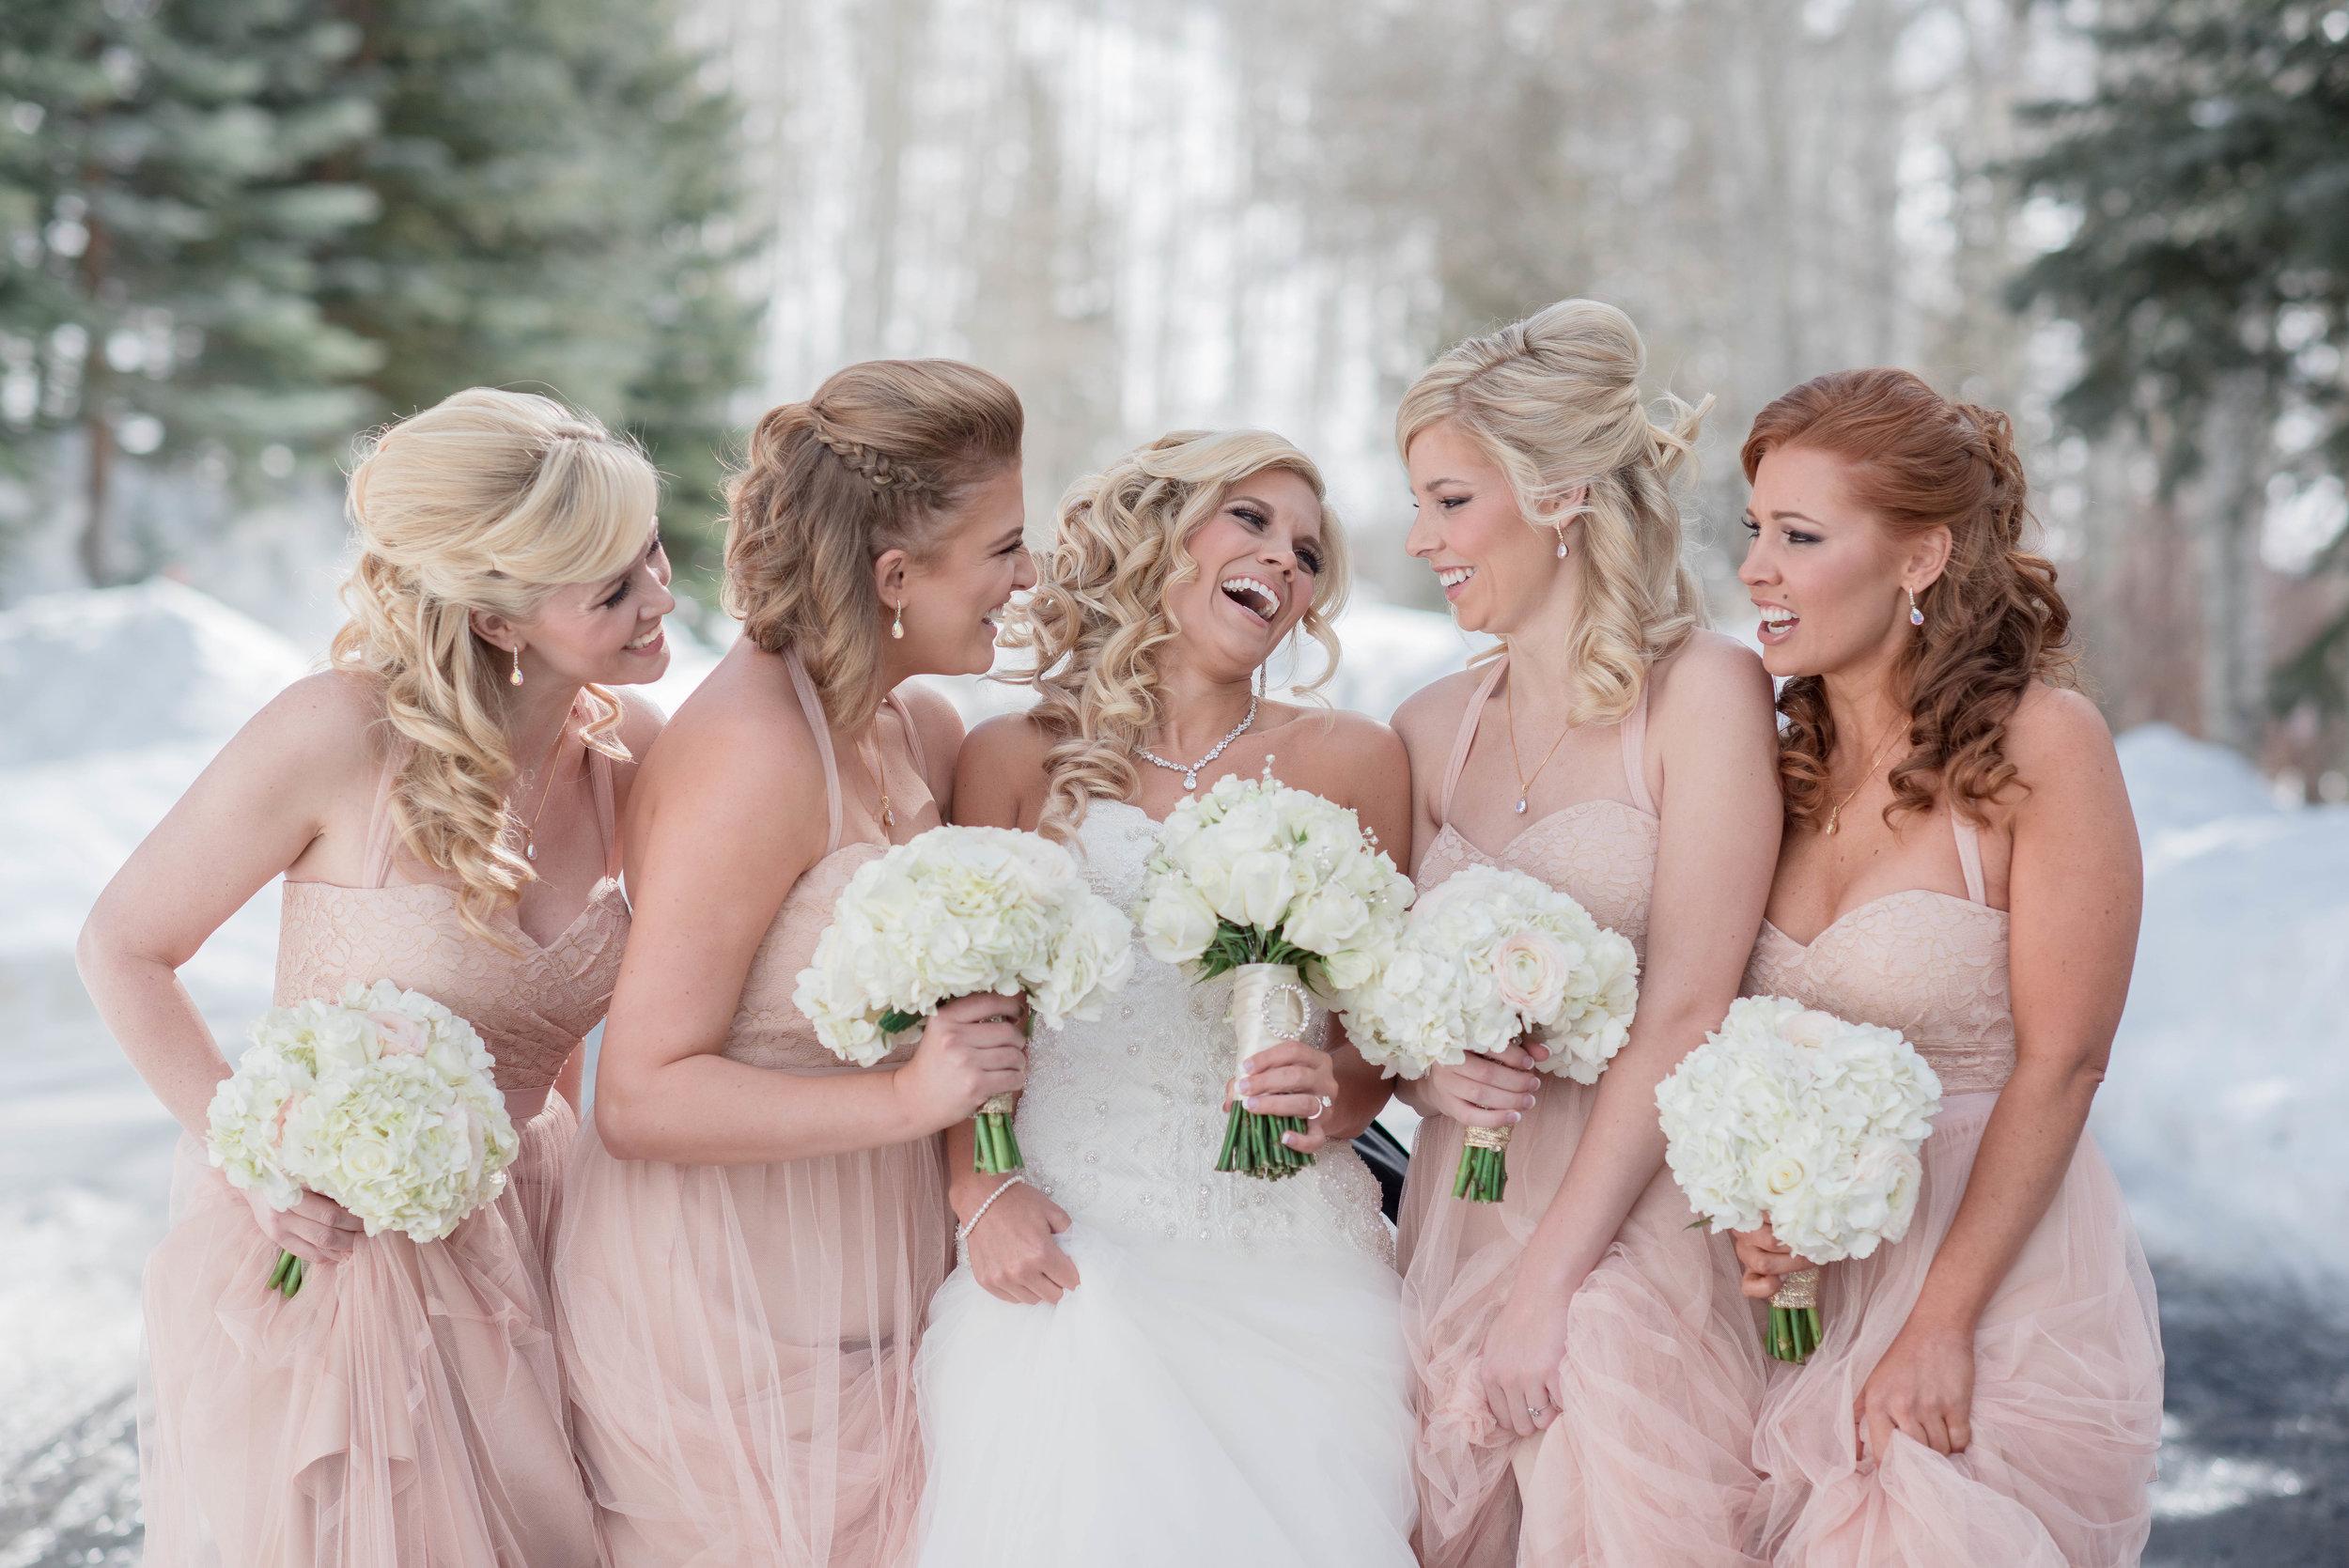 donavon pavillion wedding